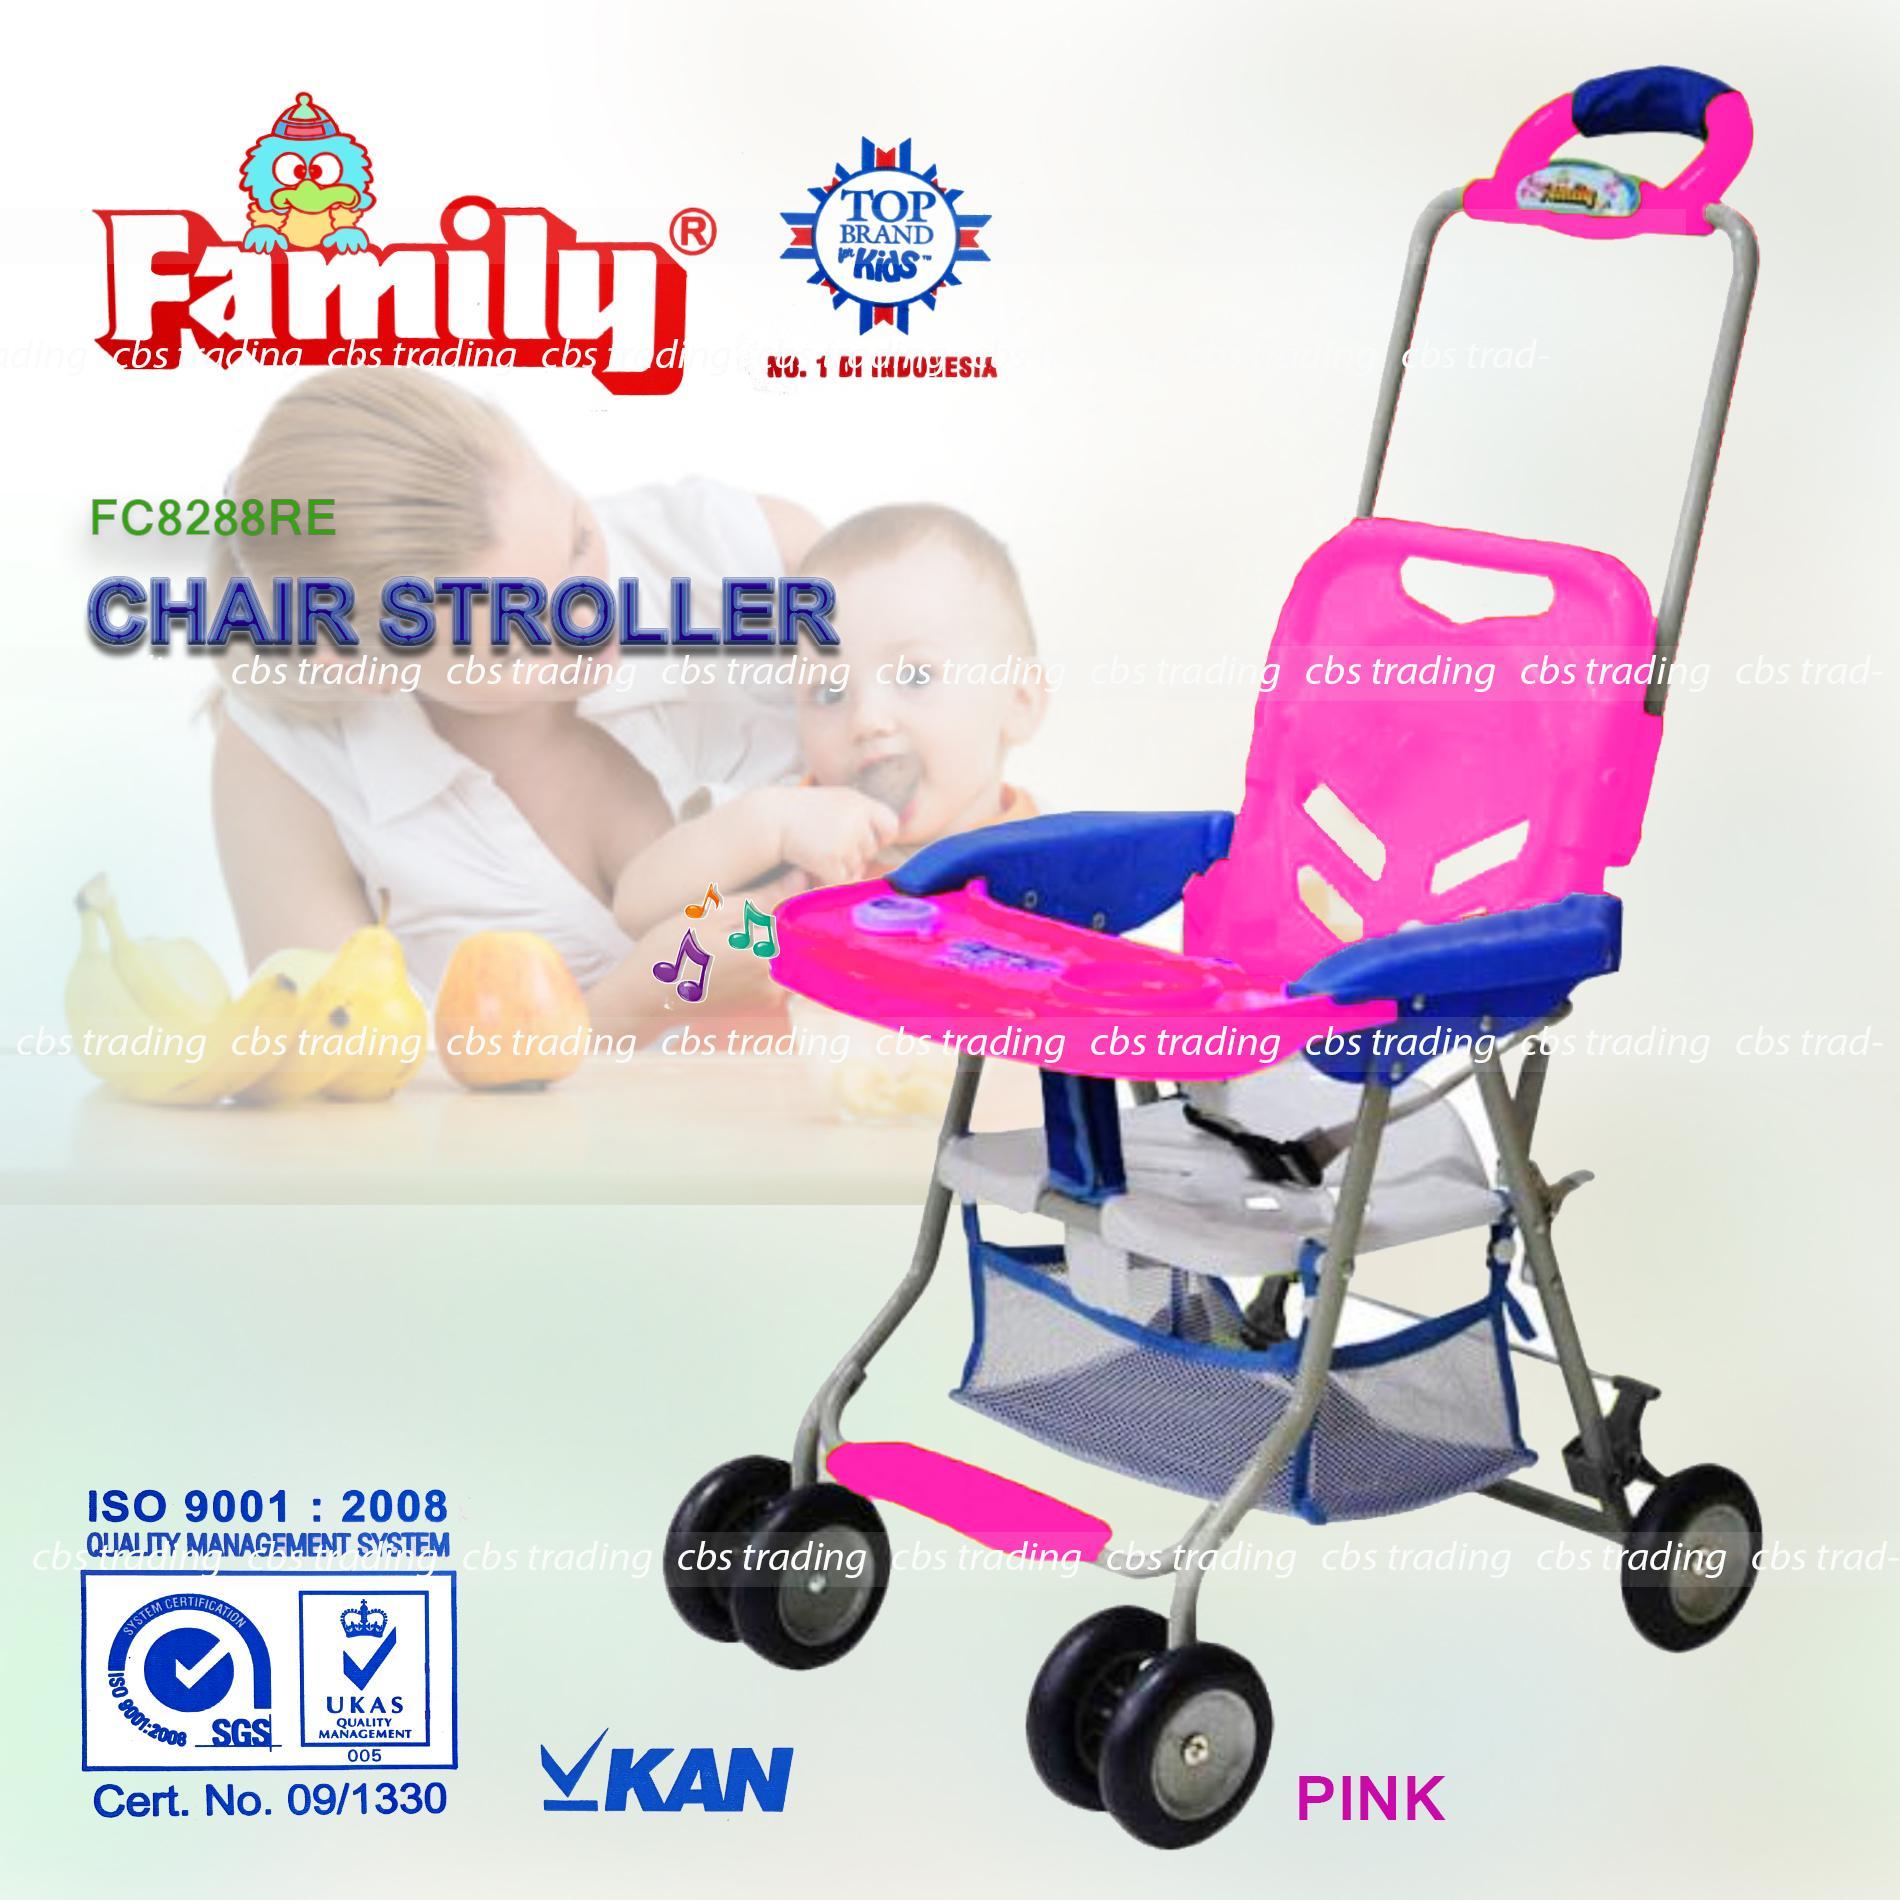 Family Chair Stroller 8288 - Kursi Makan - Baby Stroller - Pink